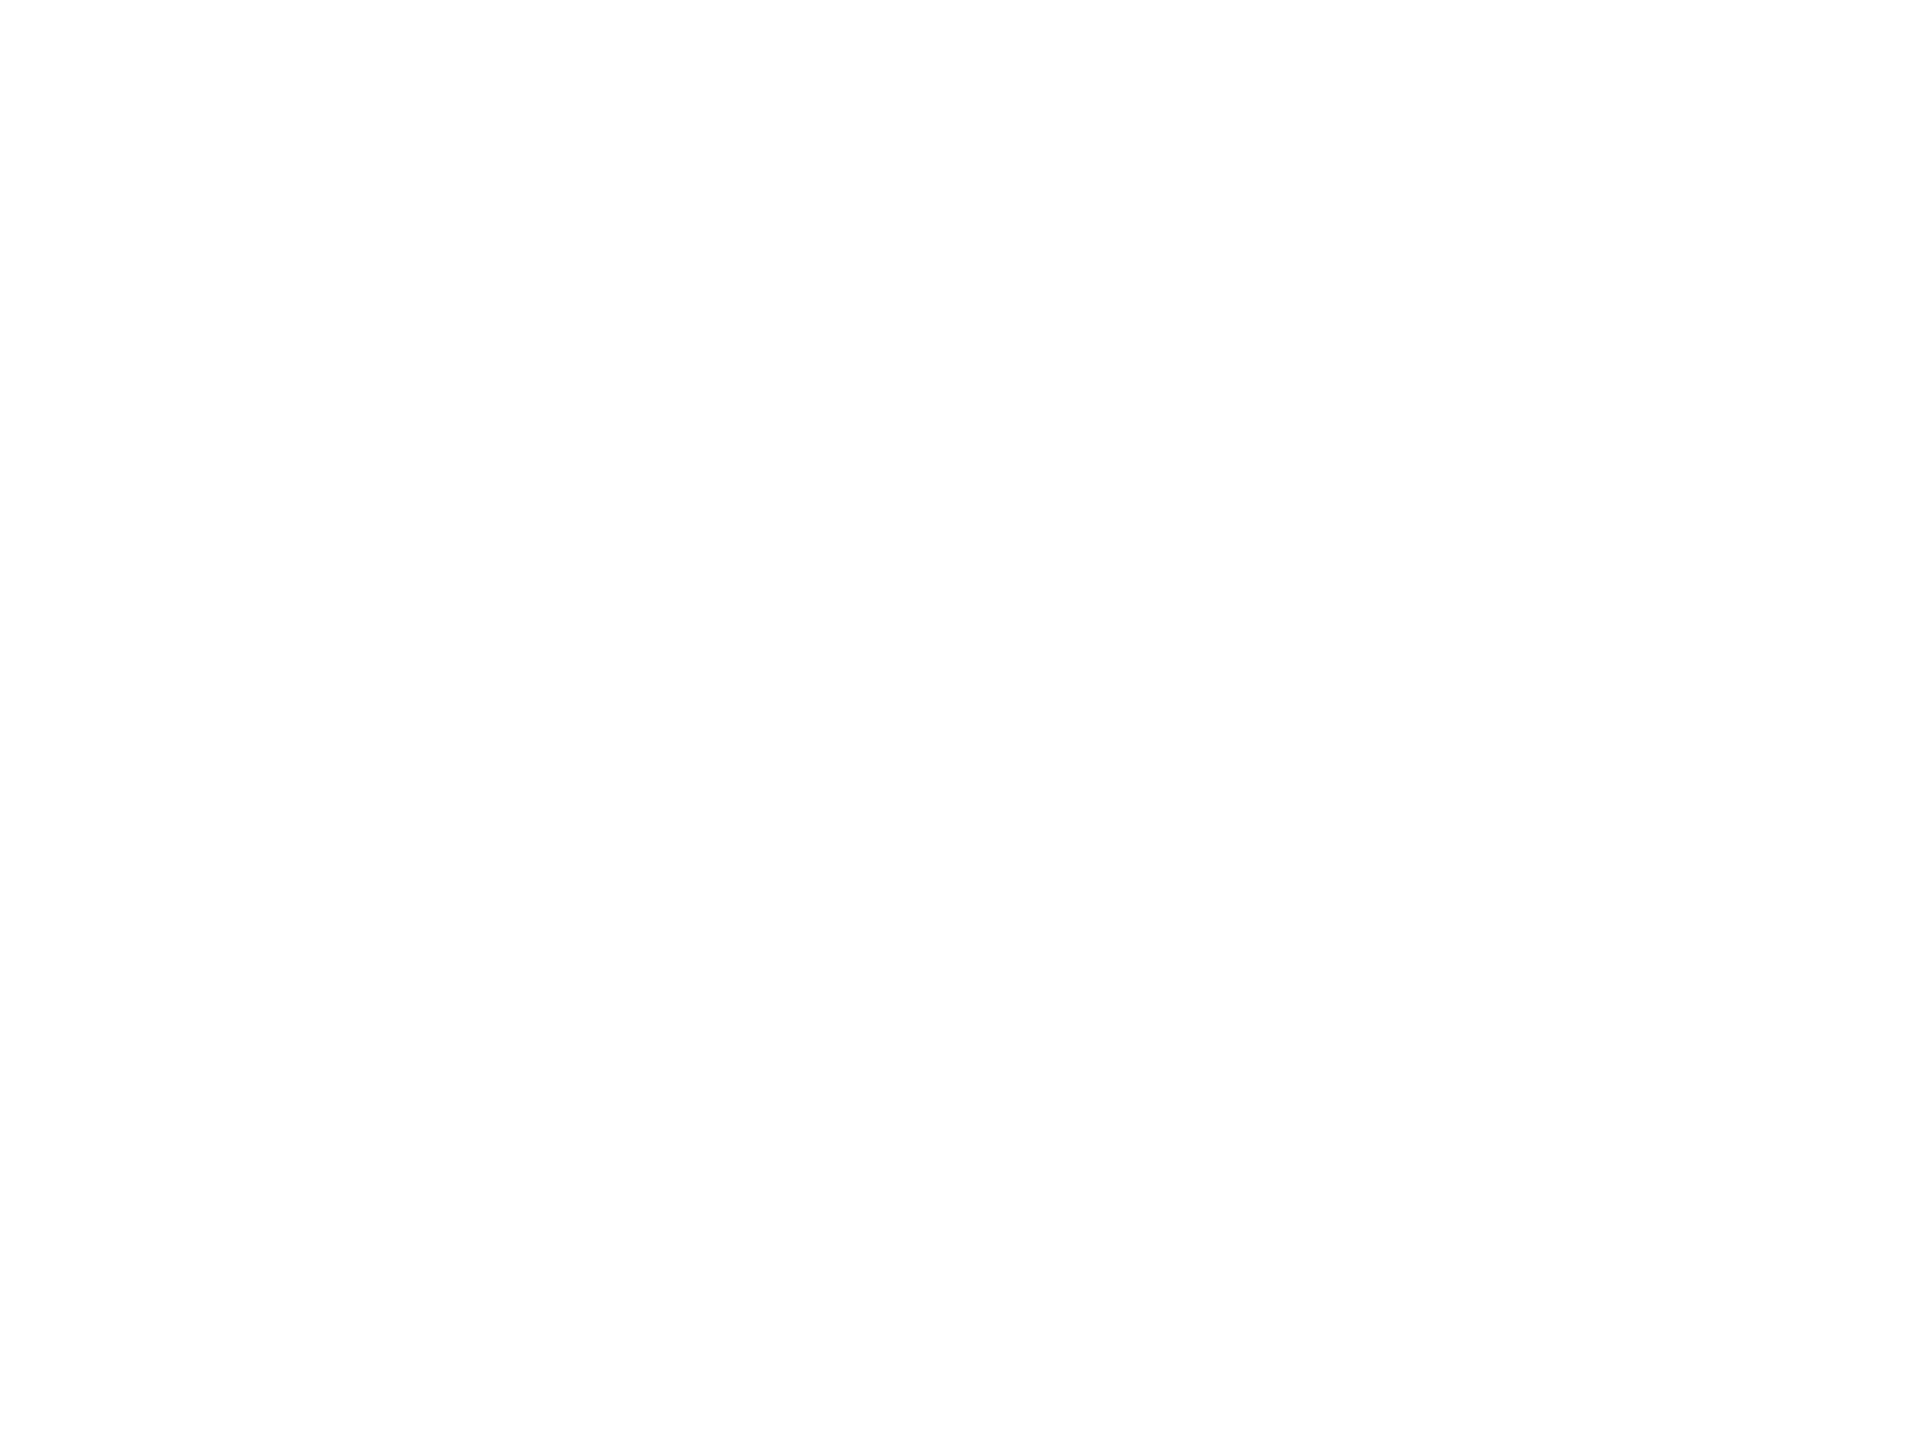 Evidid marketing tlogo